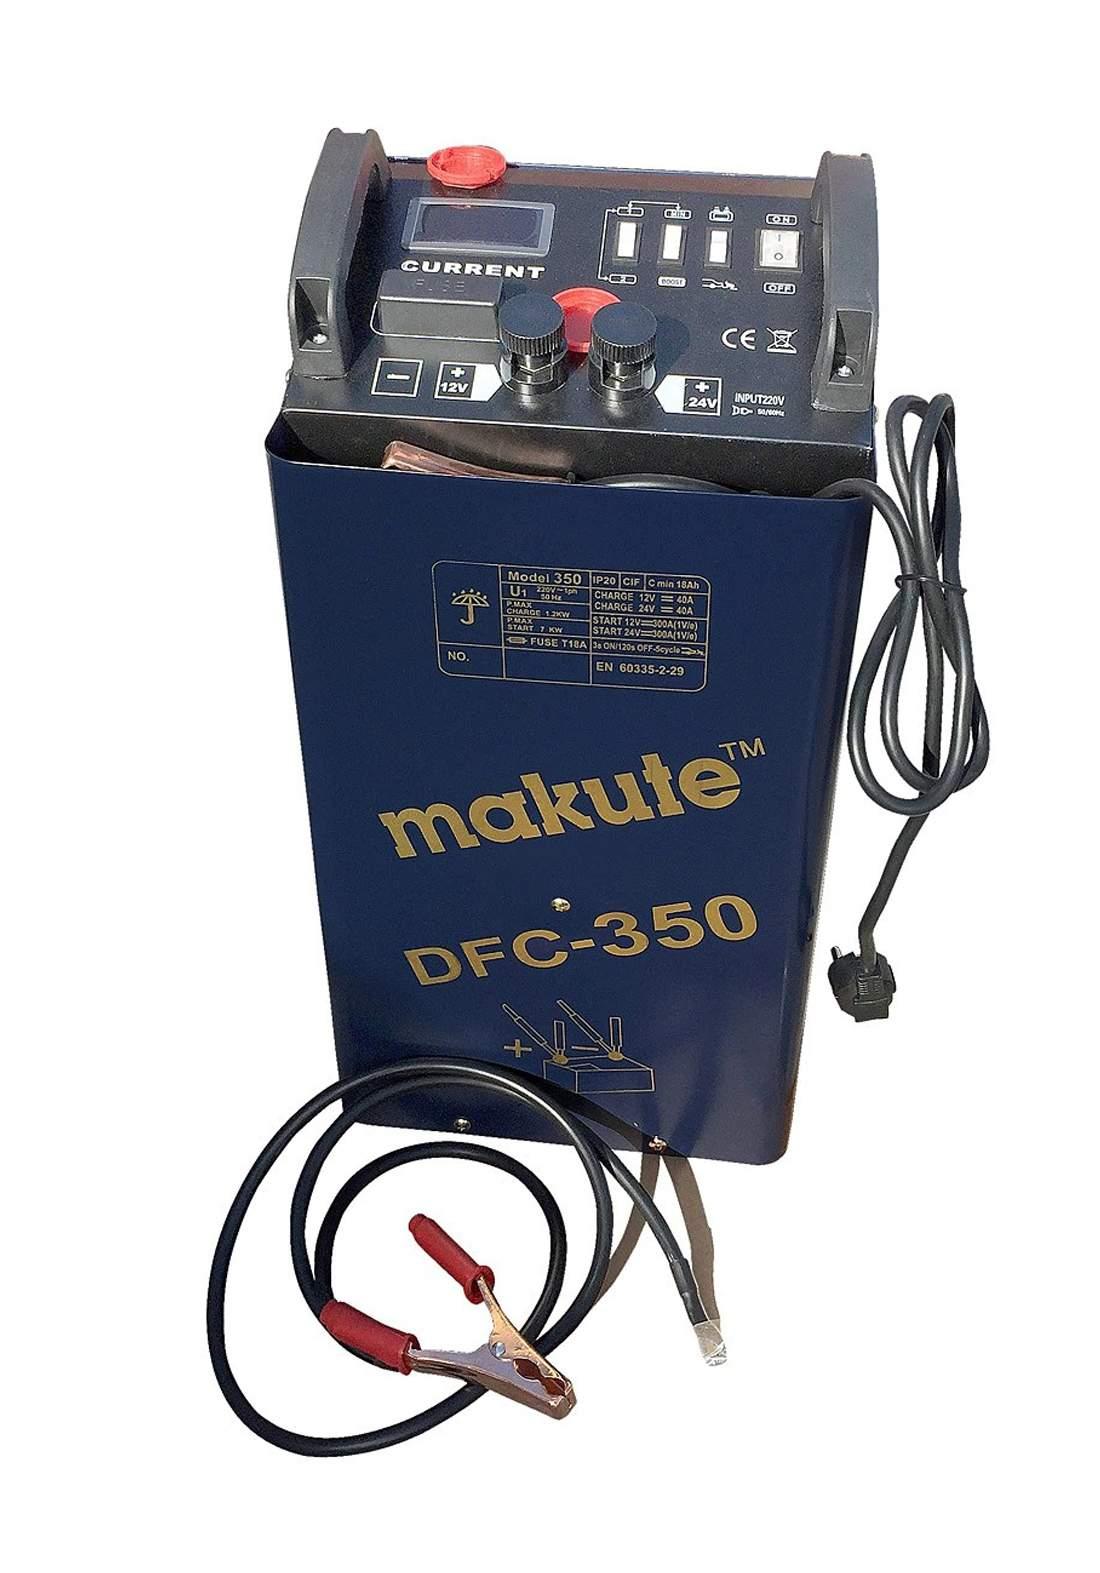 Makute  DFC-350 Car Starter Robot / Battery Chargers شاحنة بطاريات السيارة+ مشغل سيارات